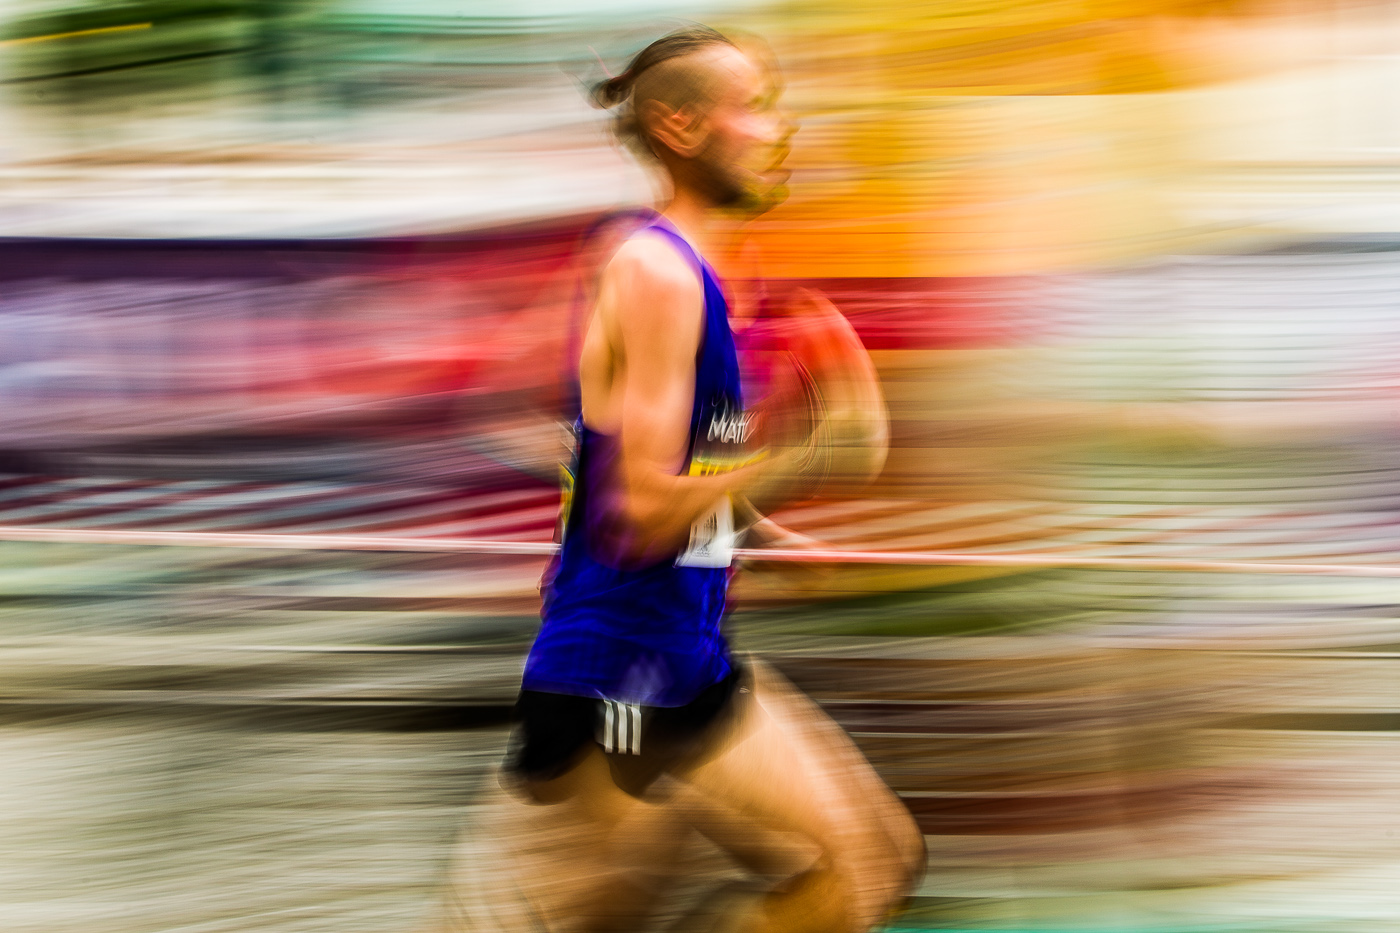 Křenek michal, půlmaraton, Karlovy Vary, RunCzech, PIM, peacemakers, fejfar